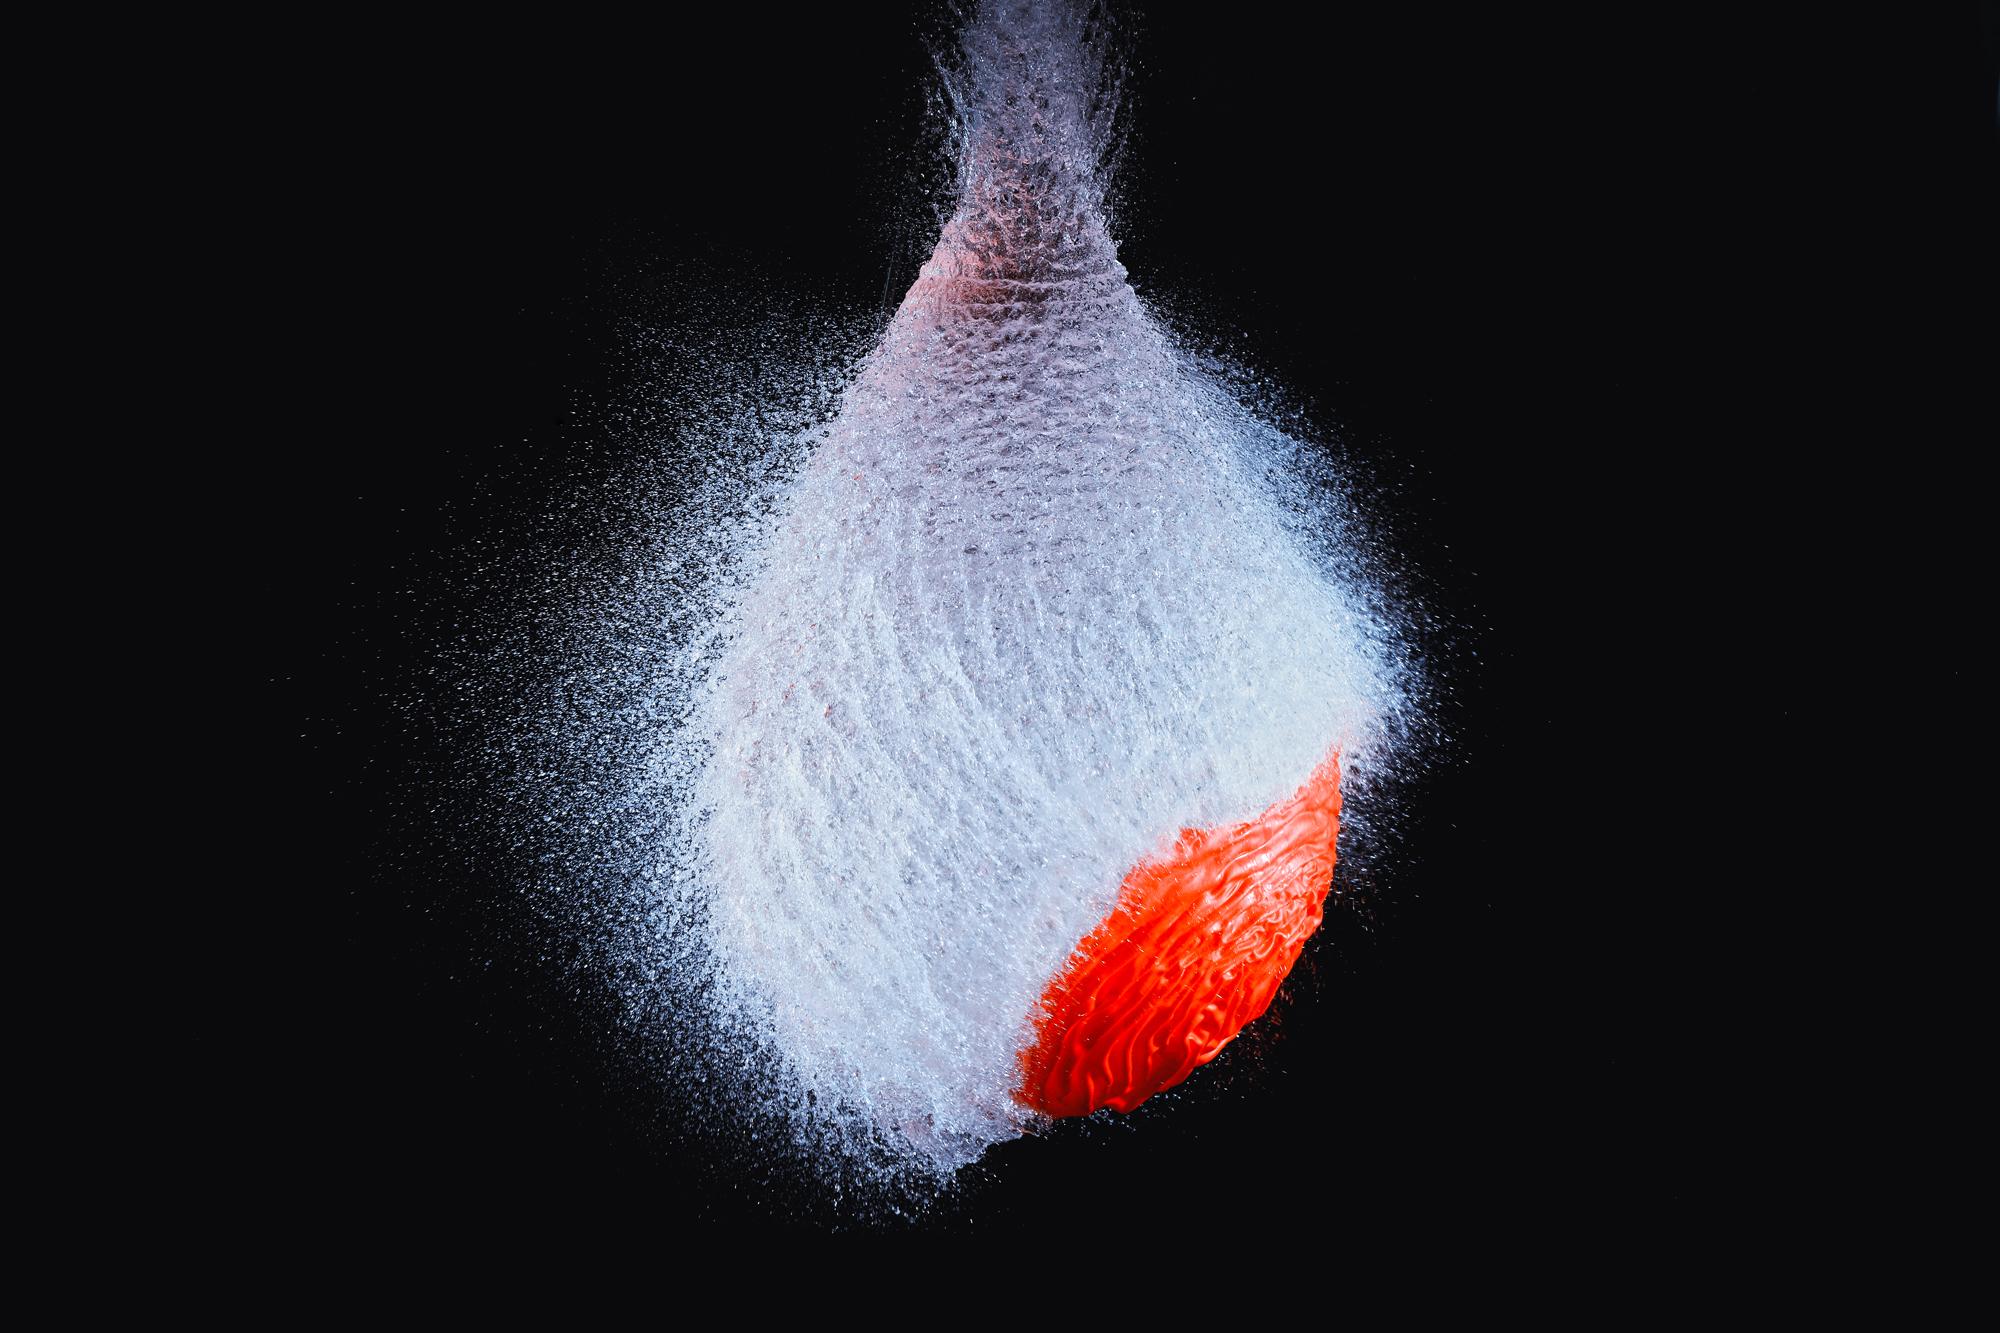 Balloon_explosion_-_George_Suresh.jpg